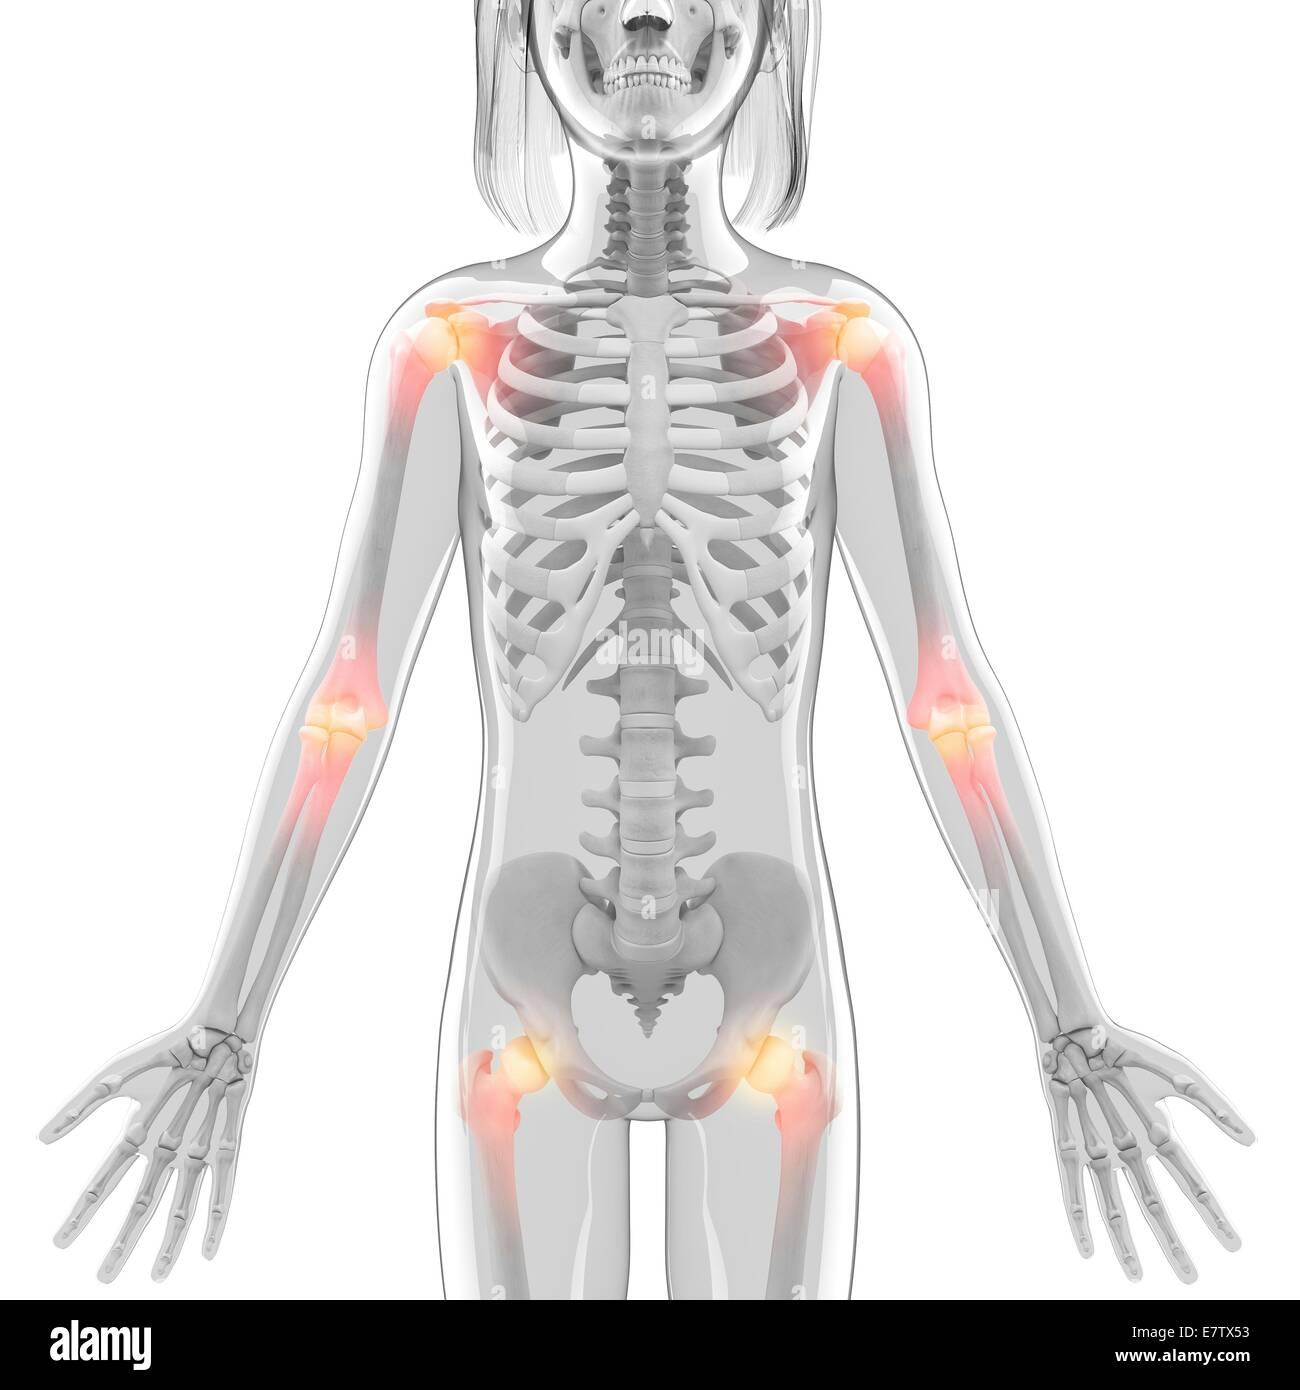 Hip Joints Skeleton Stock Photos Amp Hip Joints Skeleton